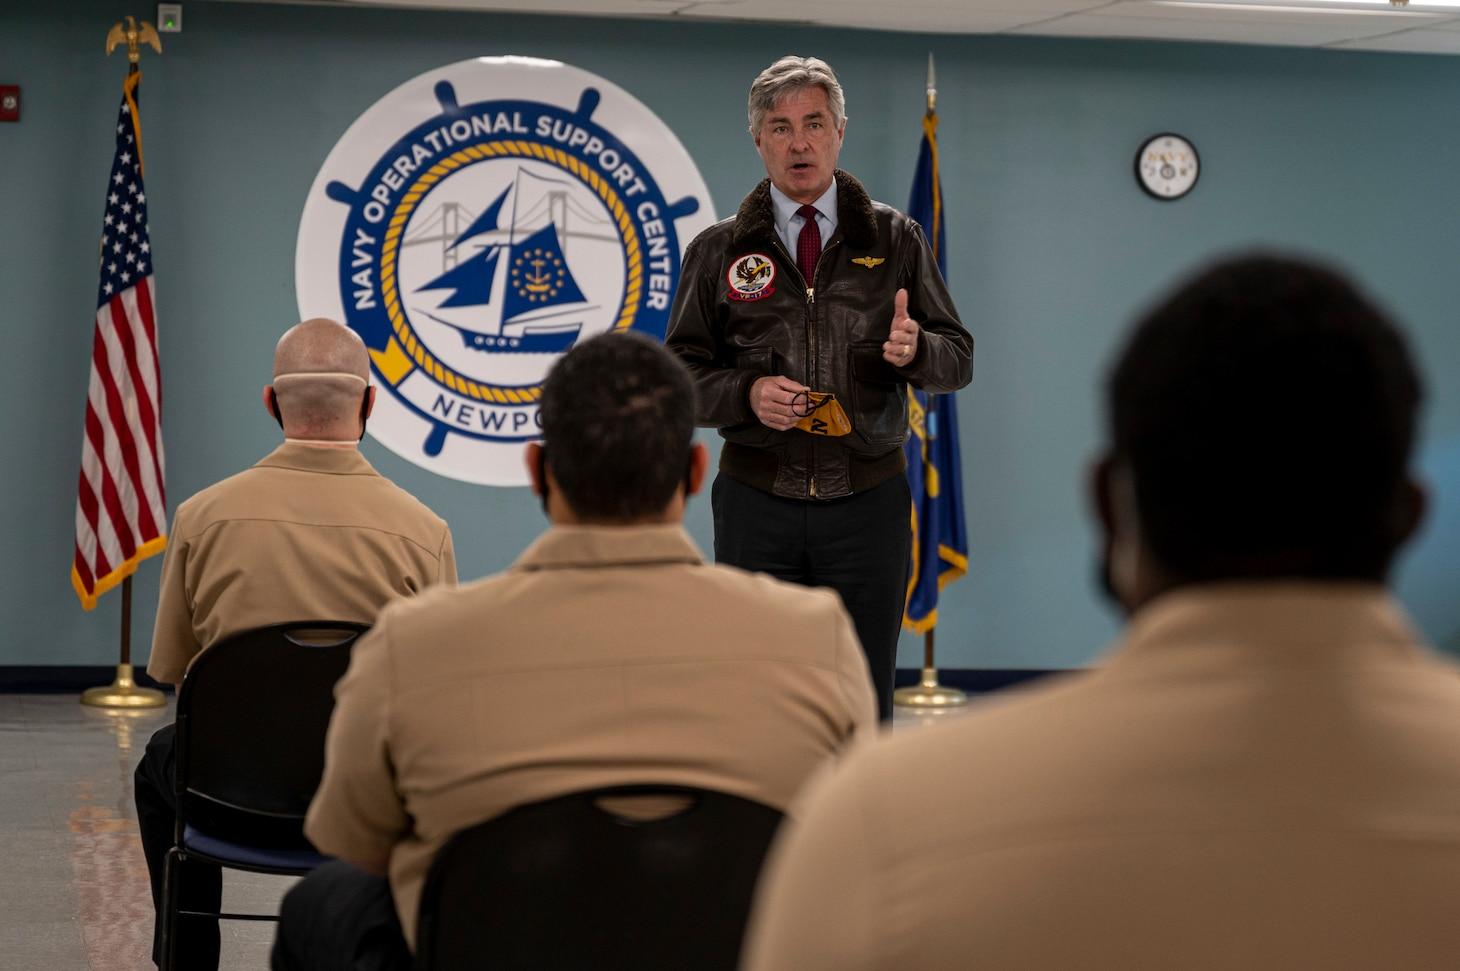 Secretary of the Navy visits NOSC Newport